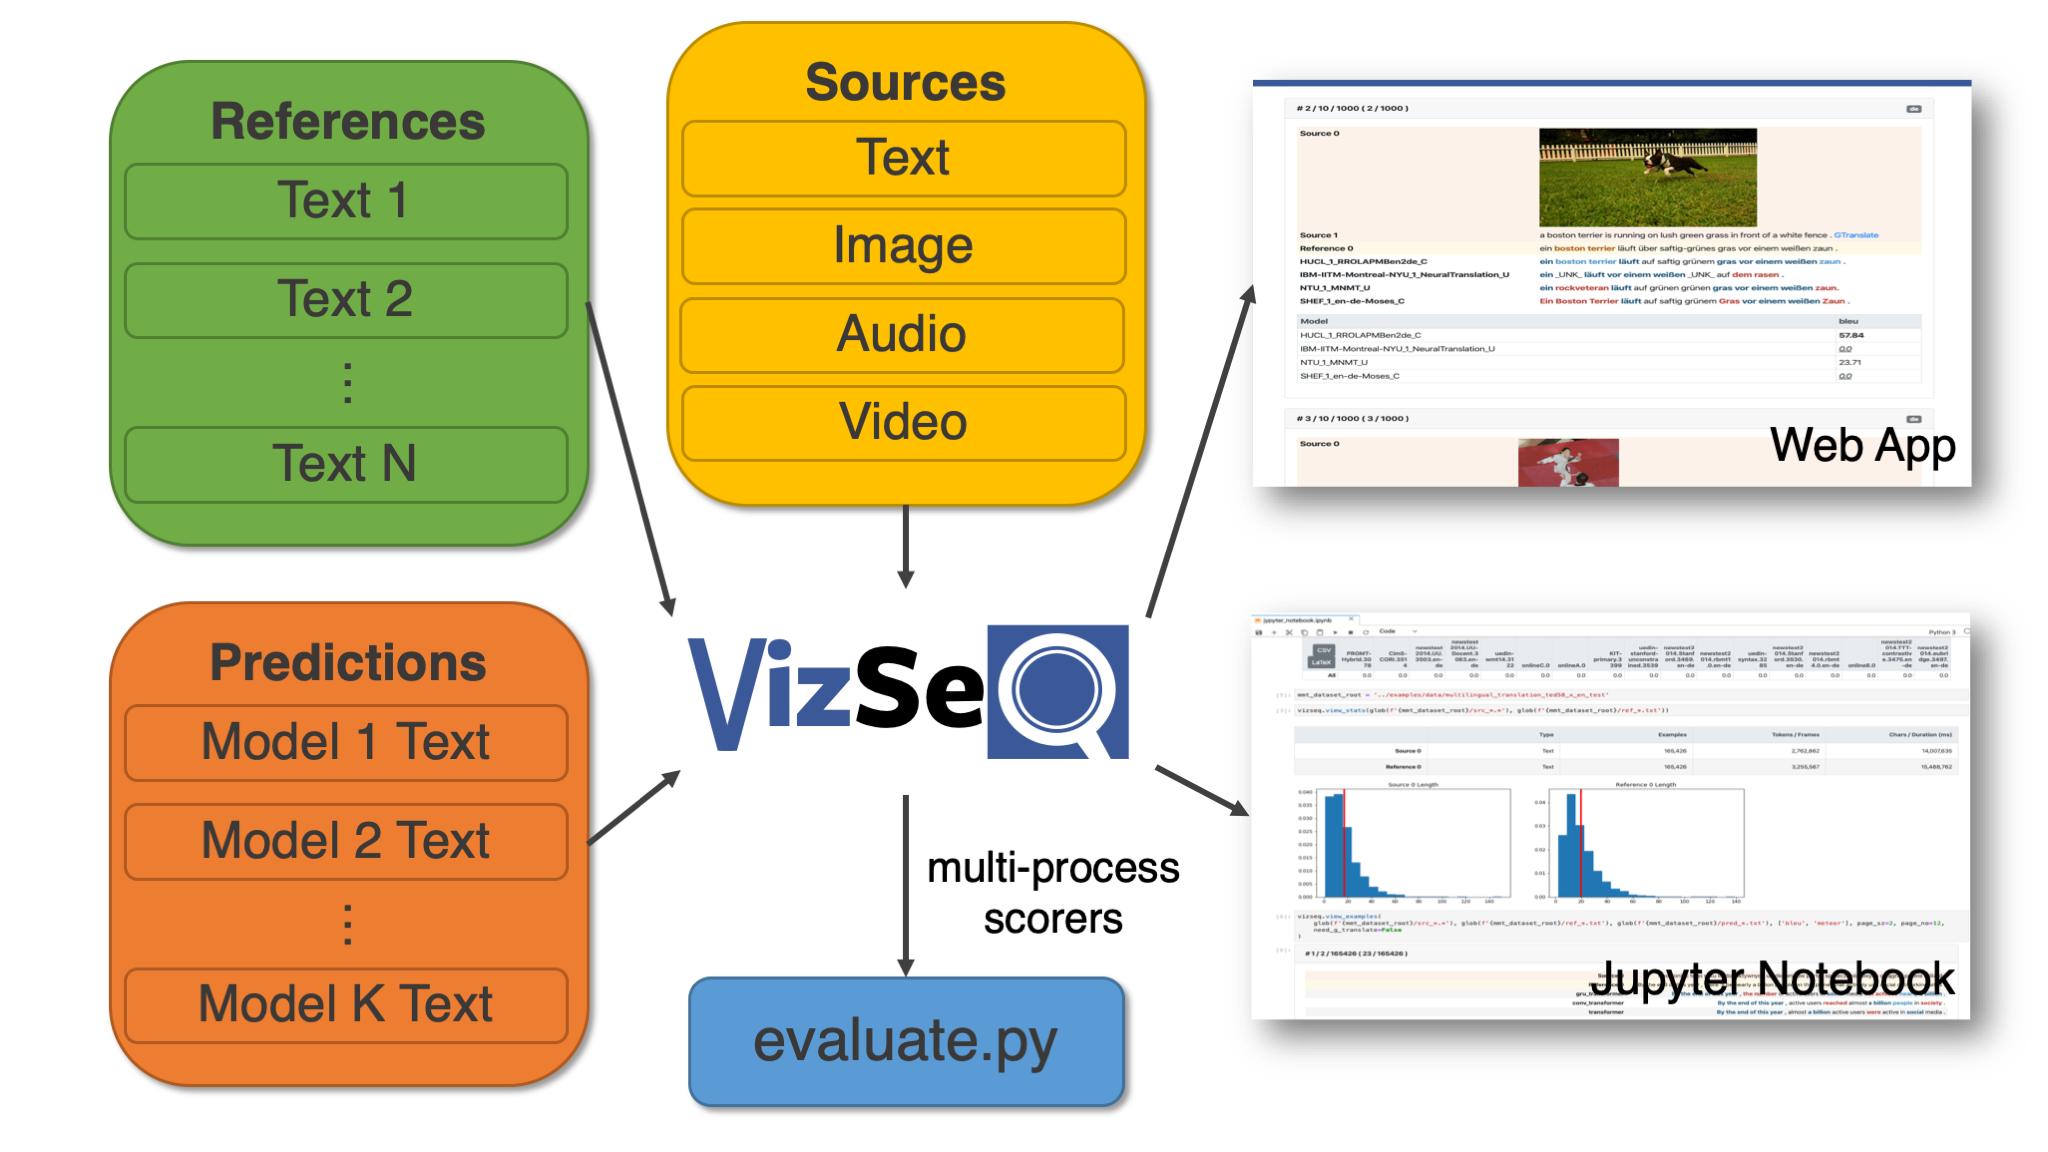 VizSeq Overview